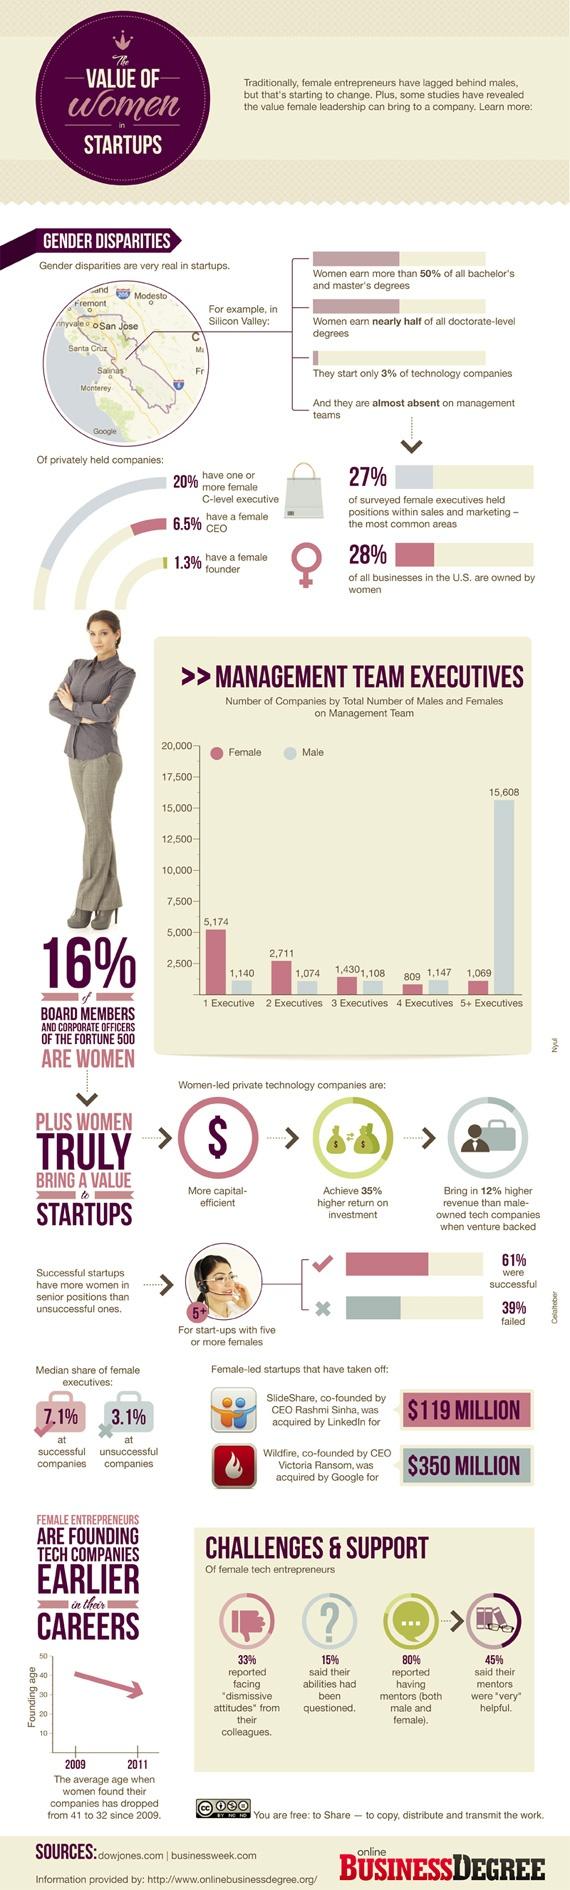 The value of women in start-ups